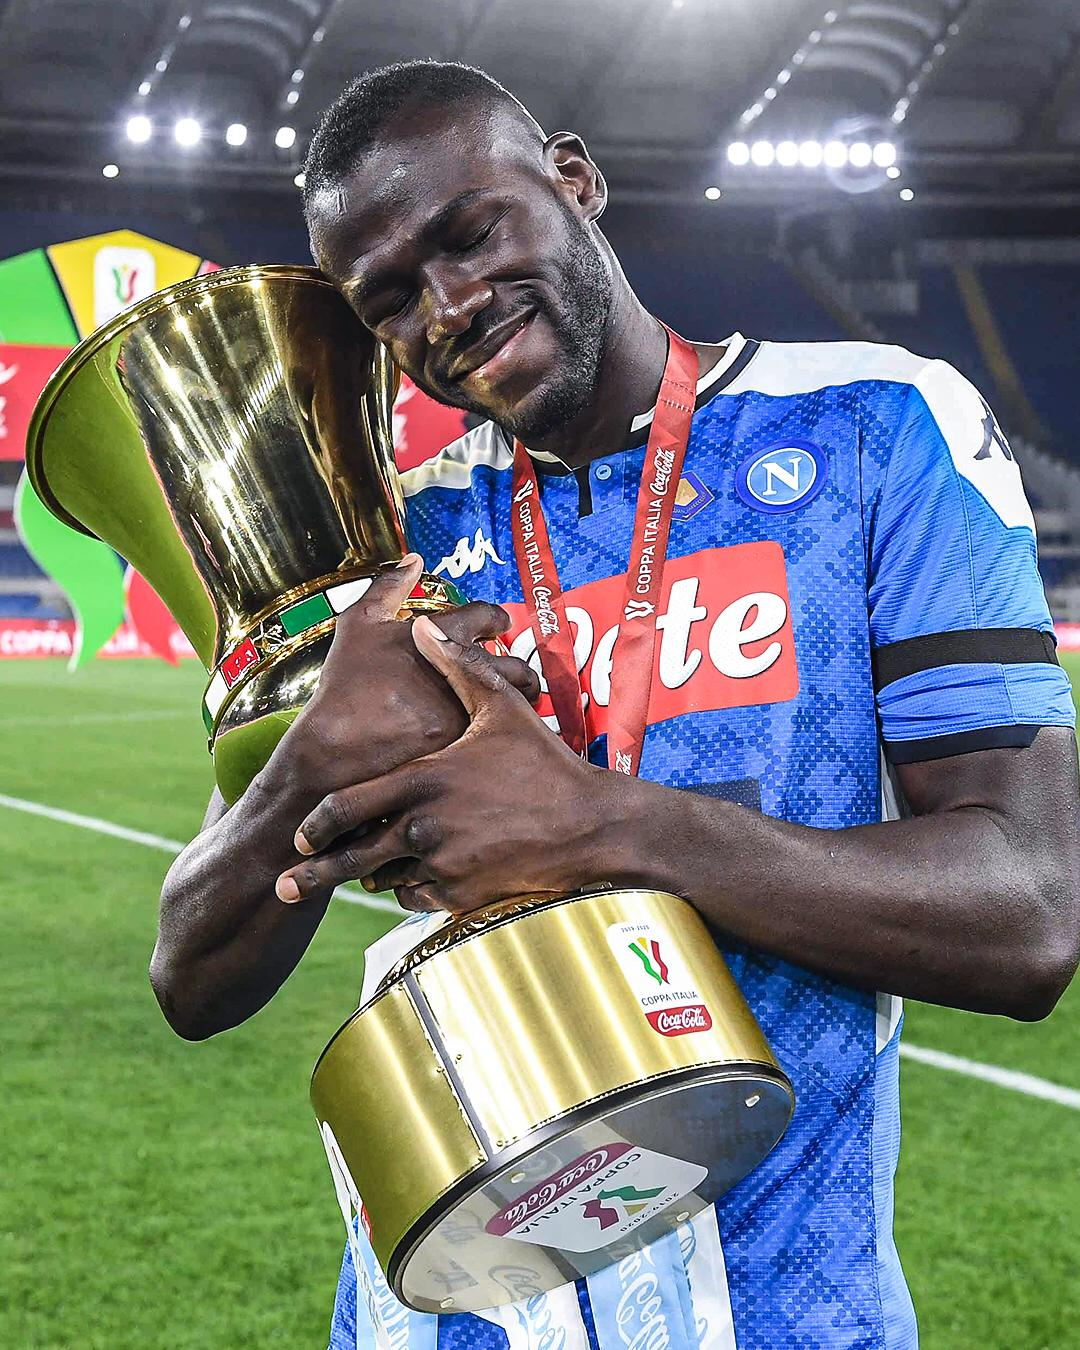 433 On Twitter Find Someone Who Hugs You Like Kkoulibaly26 Hugs The Coppa Italia Trophy